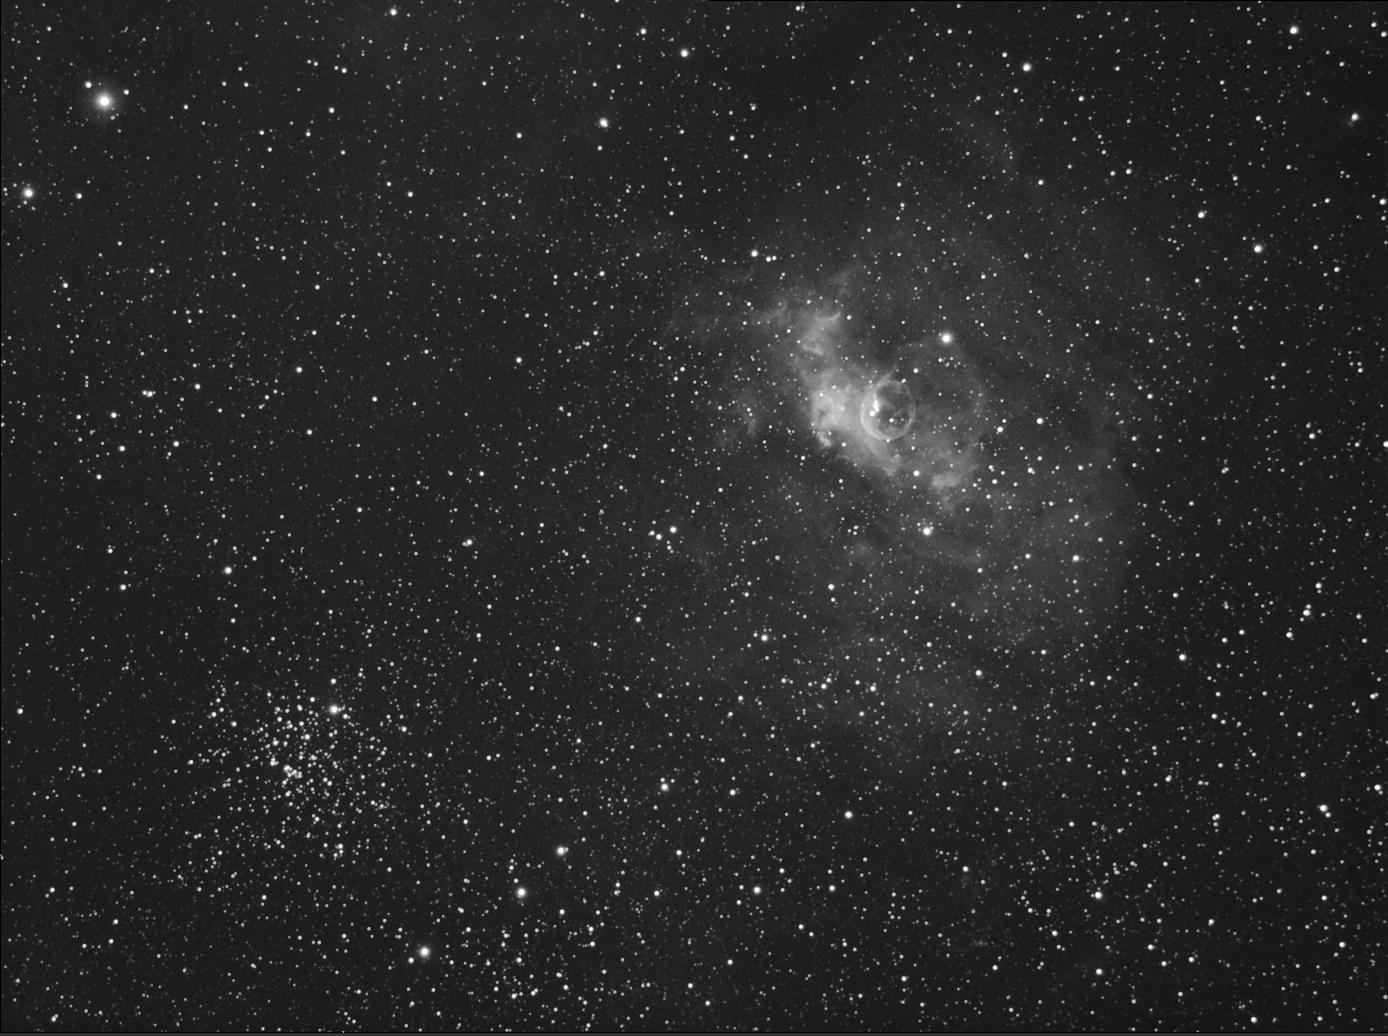 Crescent Nebula in Hydrogen Alpha